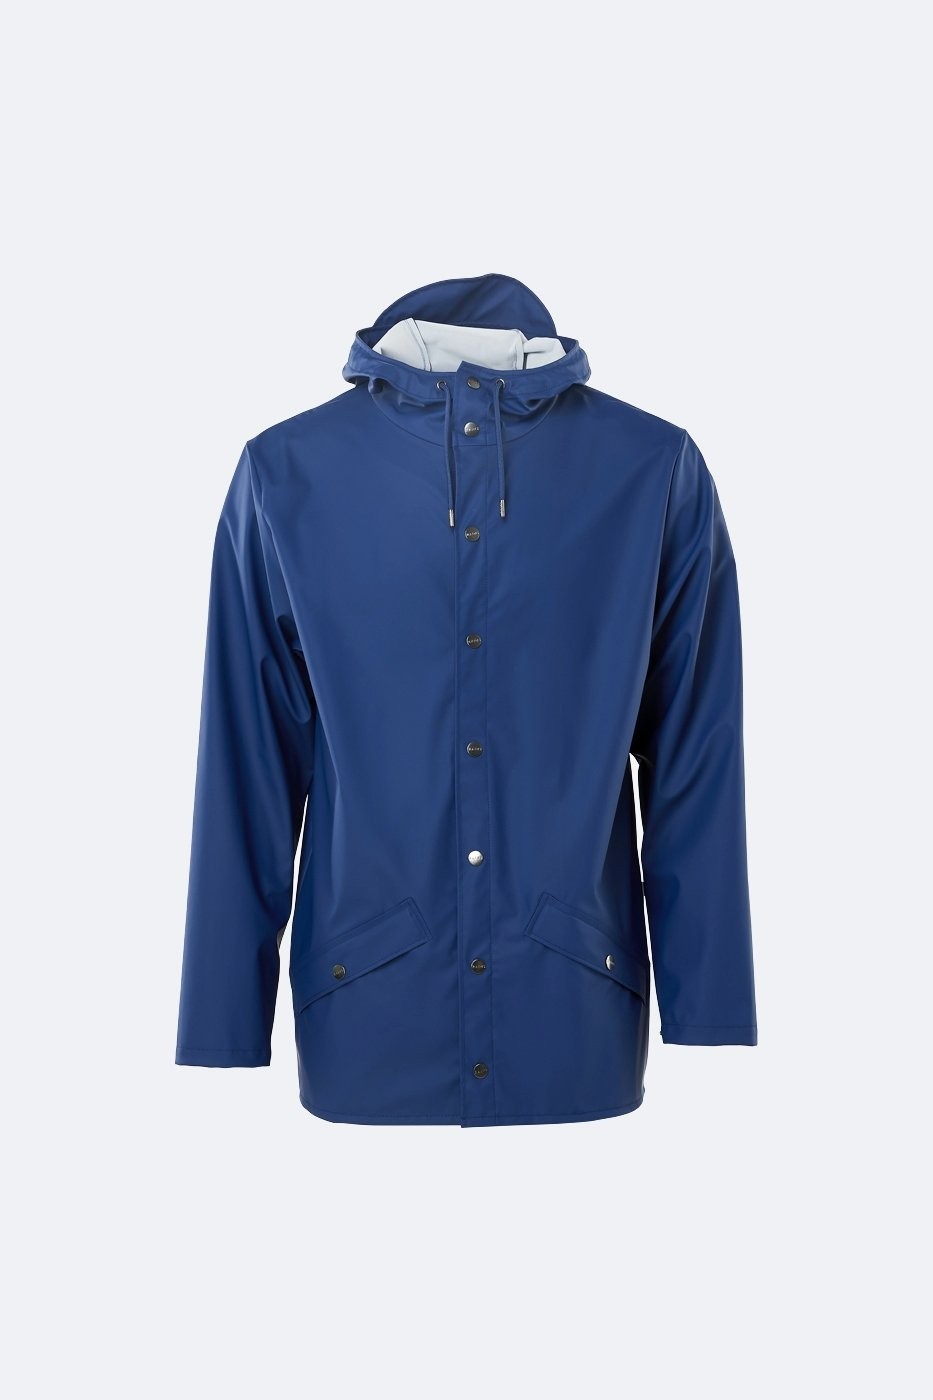 Rains Jacket true blue unisex S/M